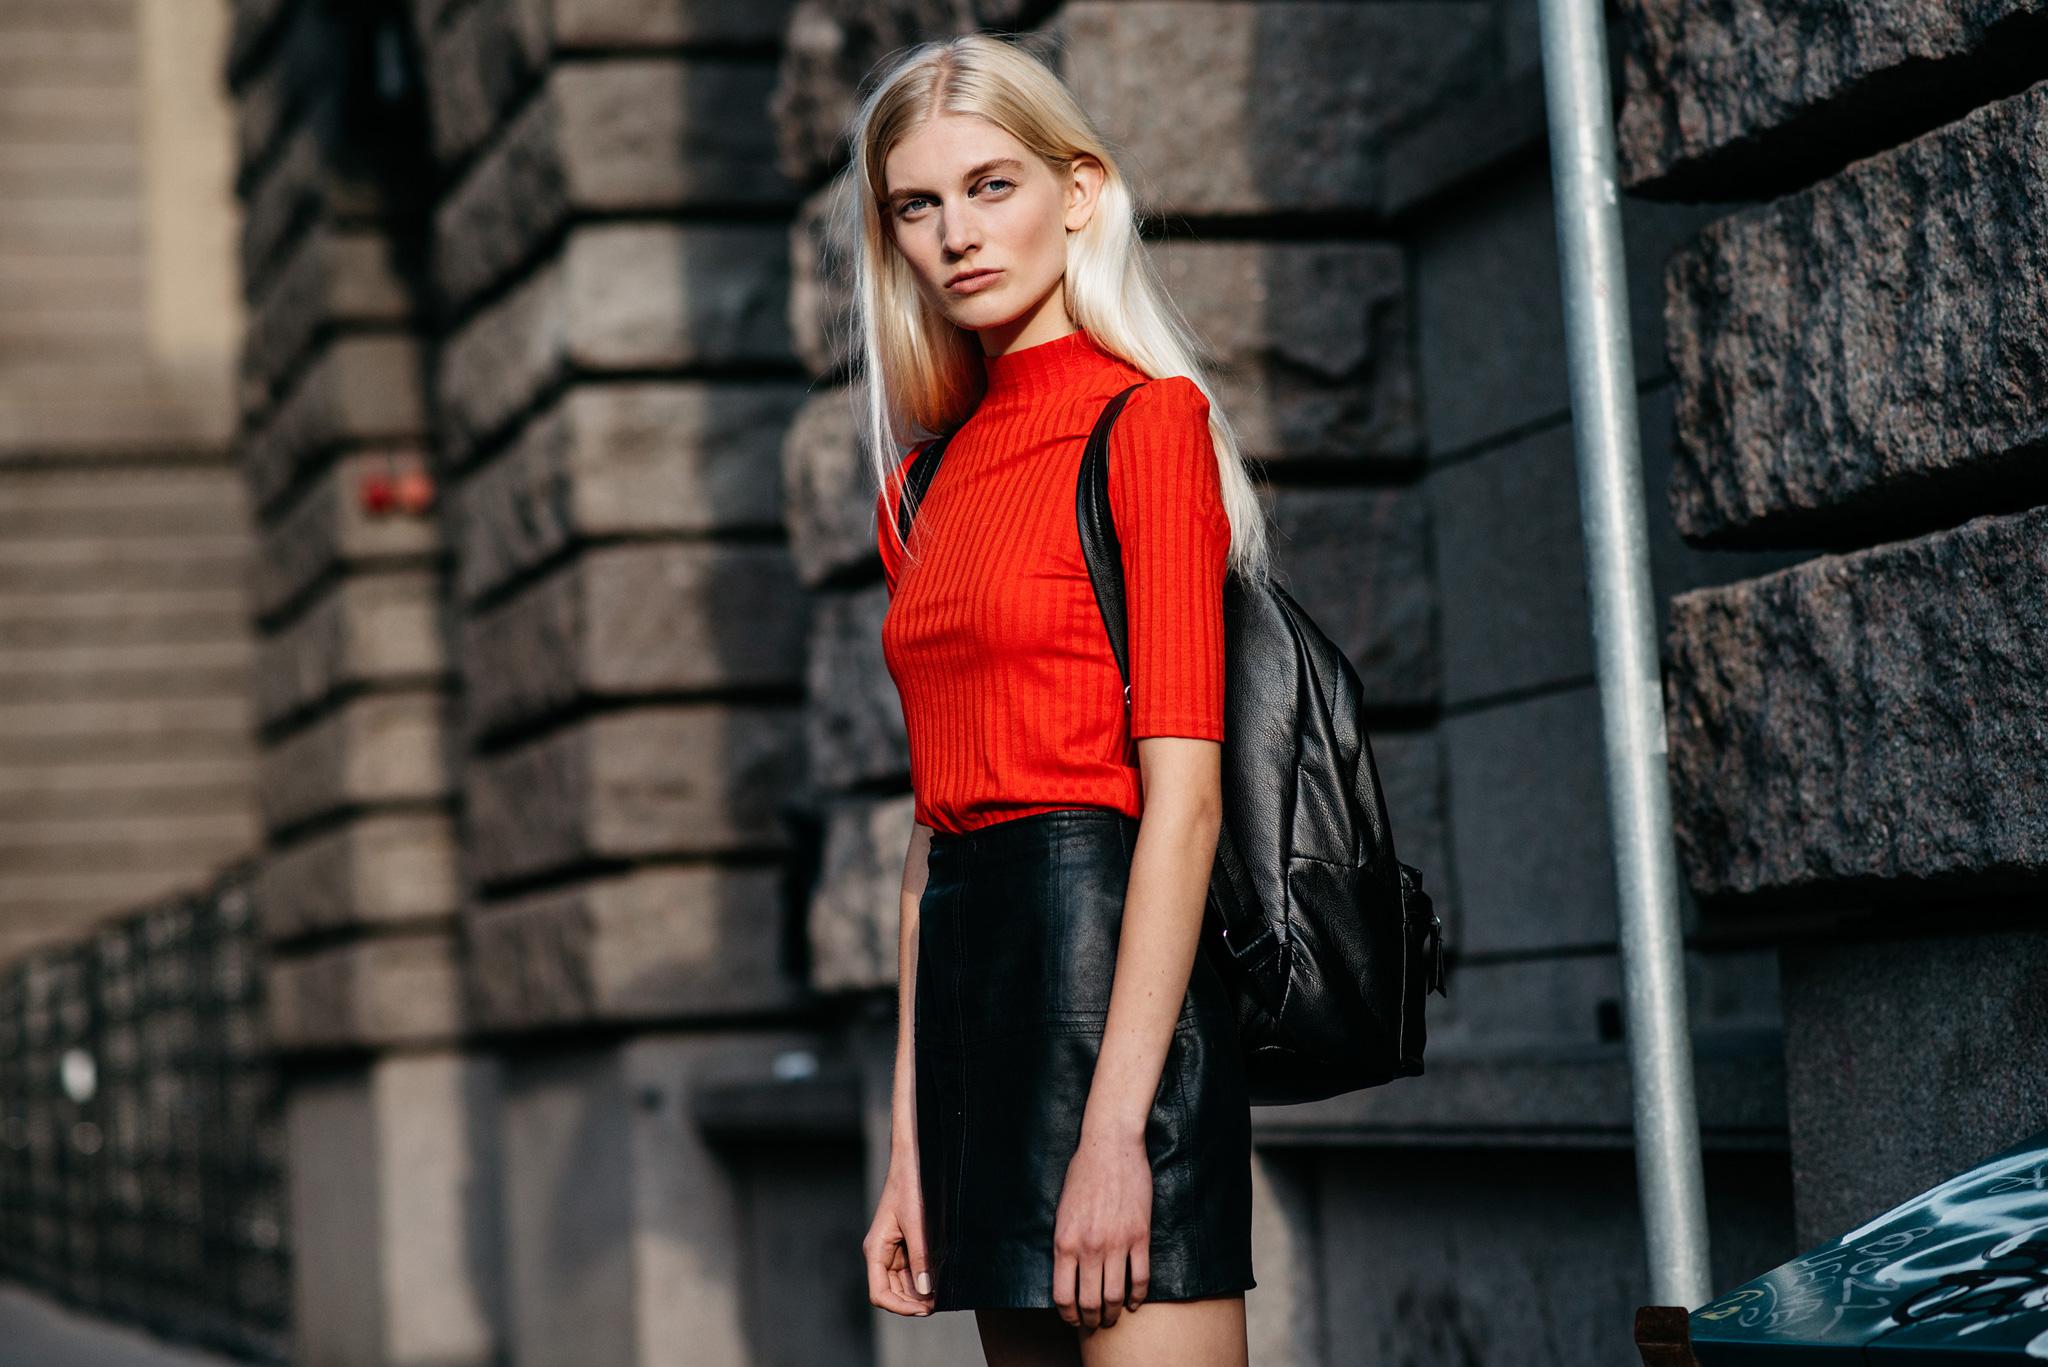 04-stockholm-fashion-week-street-style-soren-11